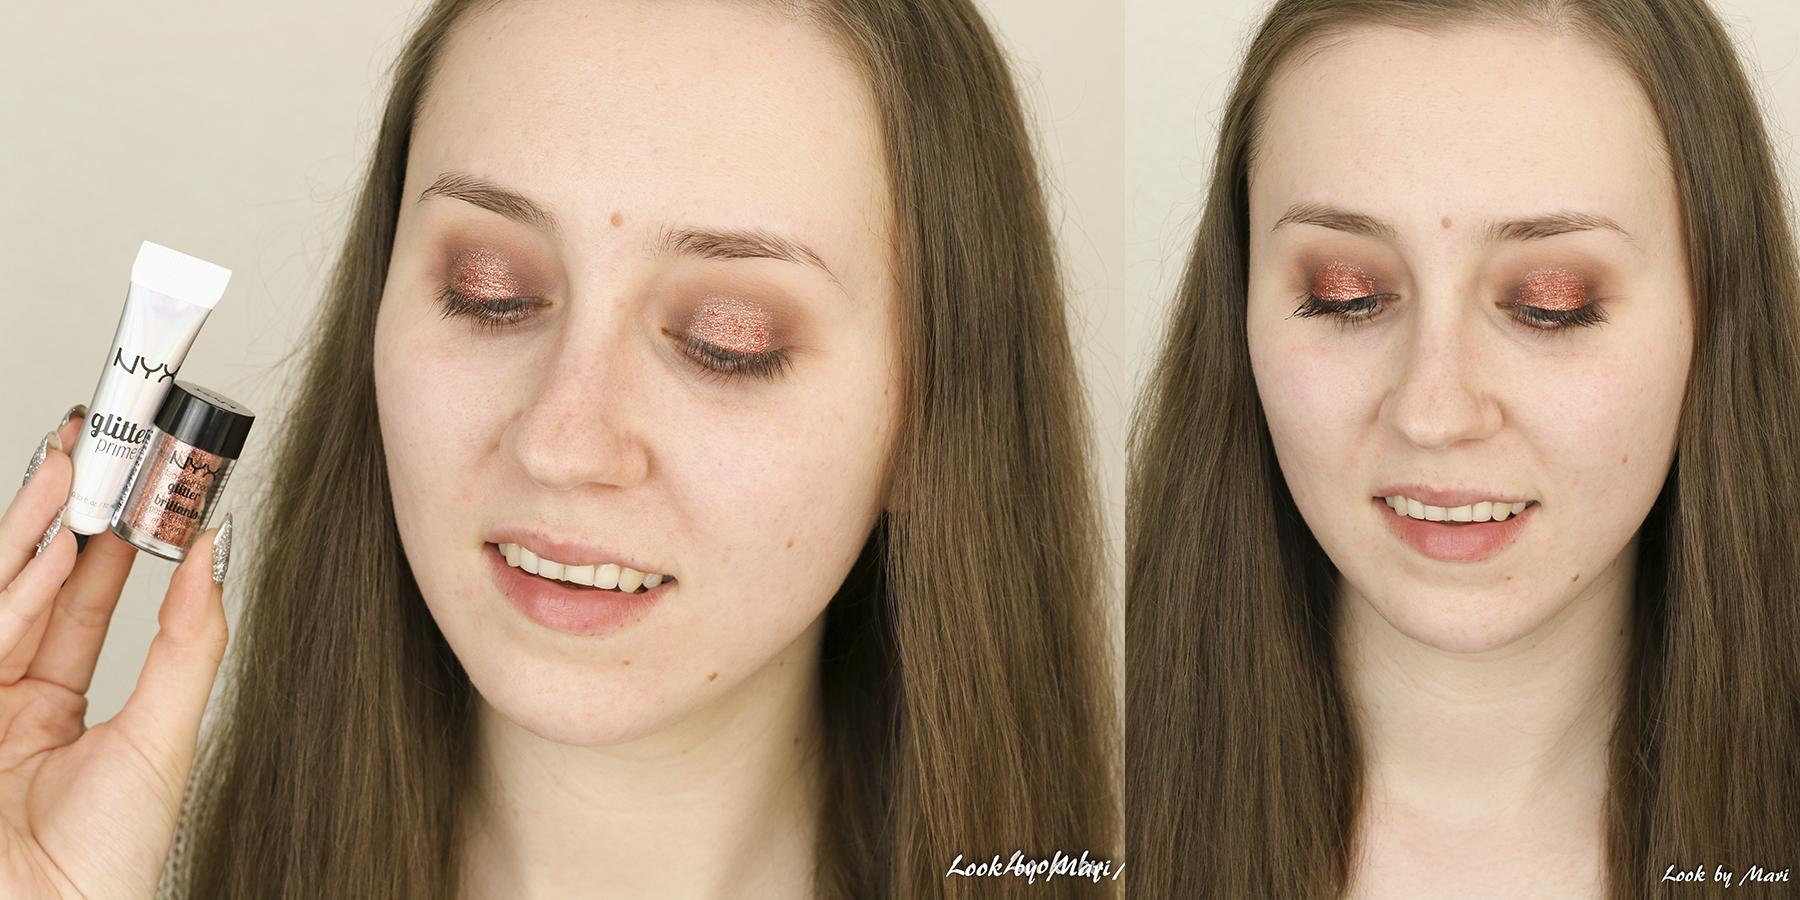 4 nyx glitter glue review kokemuksia nyx face & body glitter copper swatches